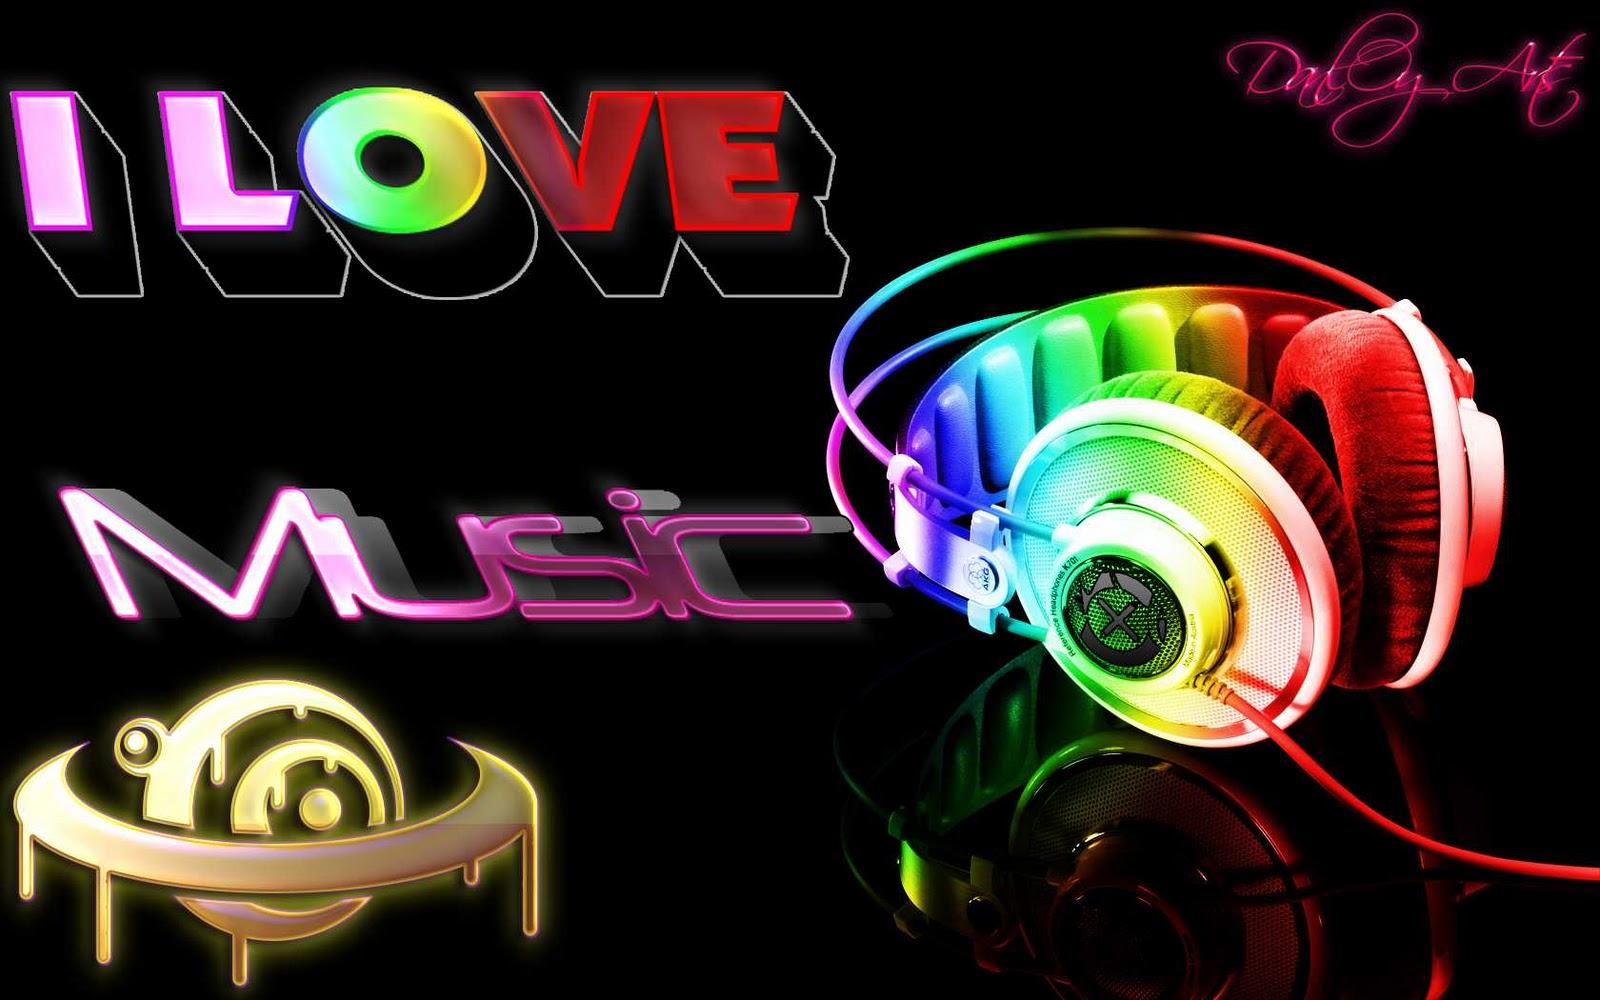 Love music db donde encontraras la mejor musica urbana del momento